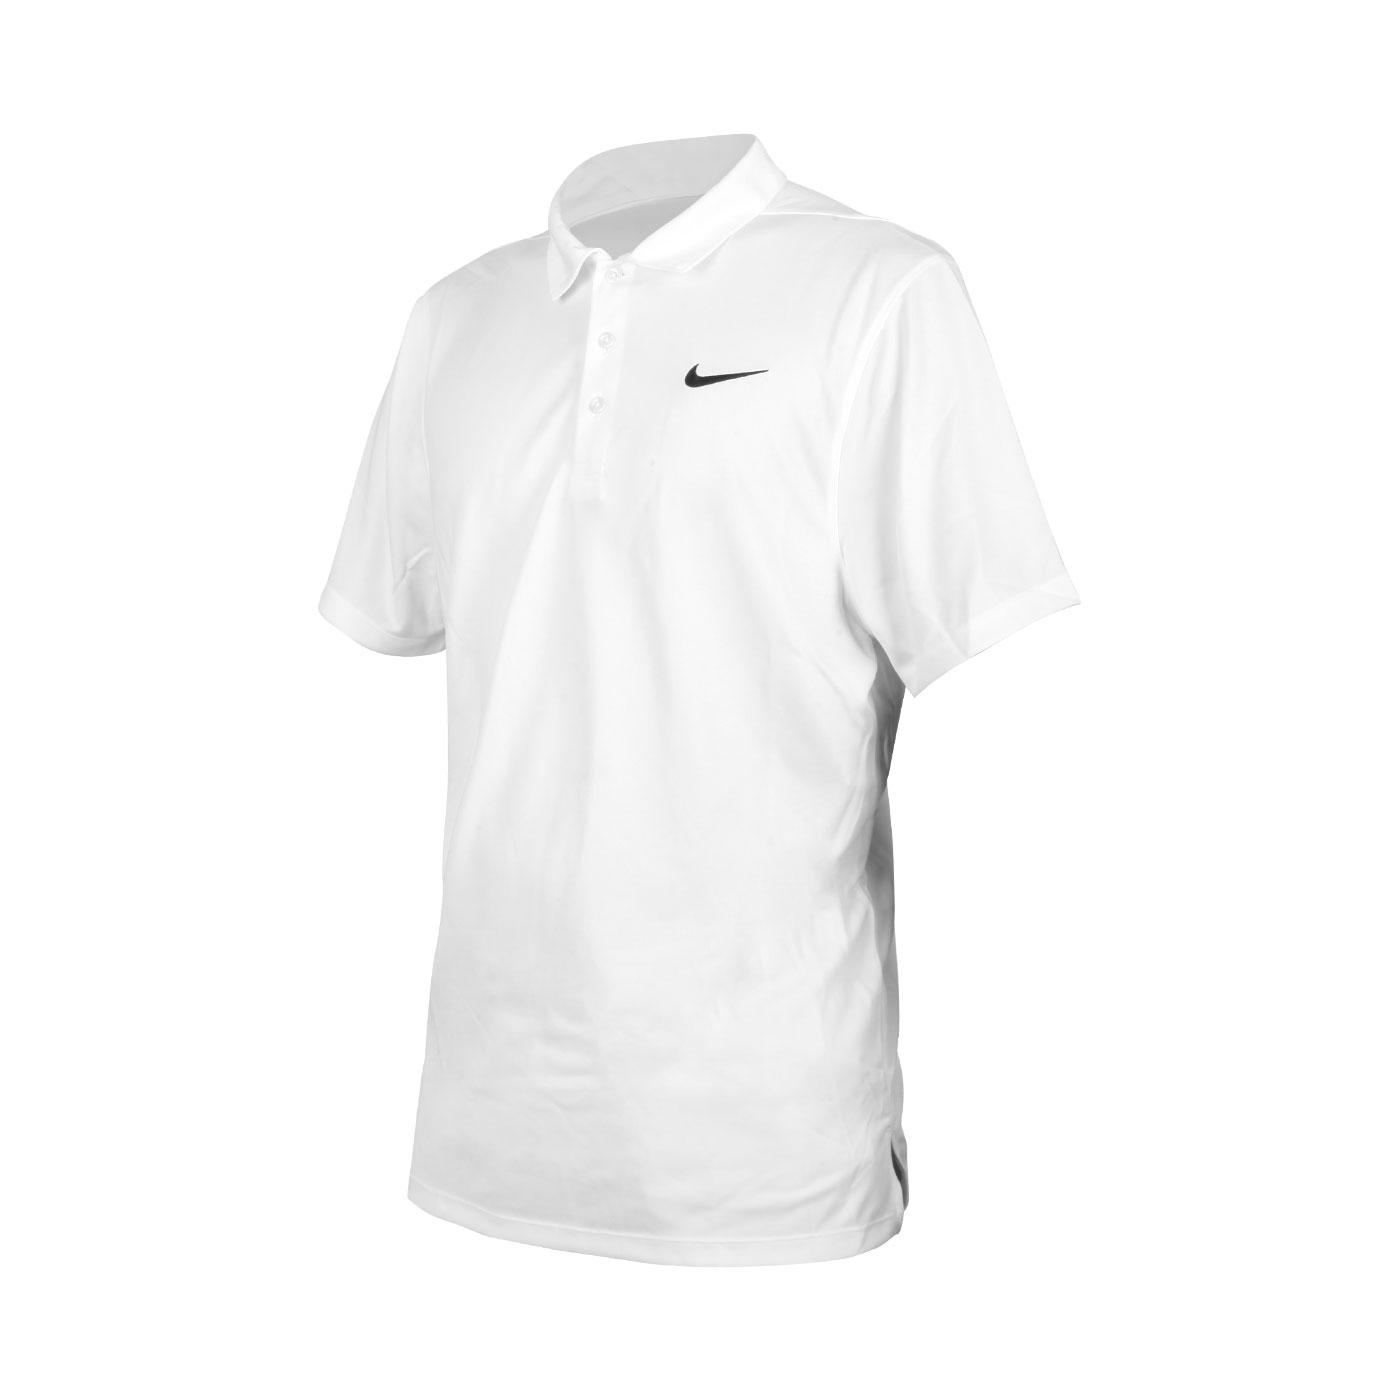 NIKE 男款短袖POLO衫 APS080-100 - 白黑